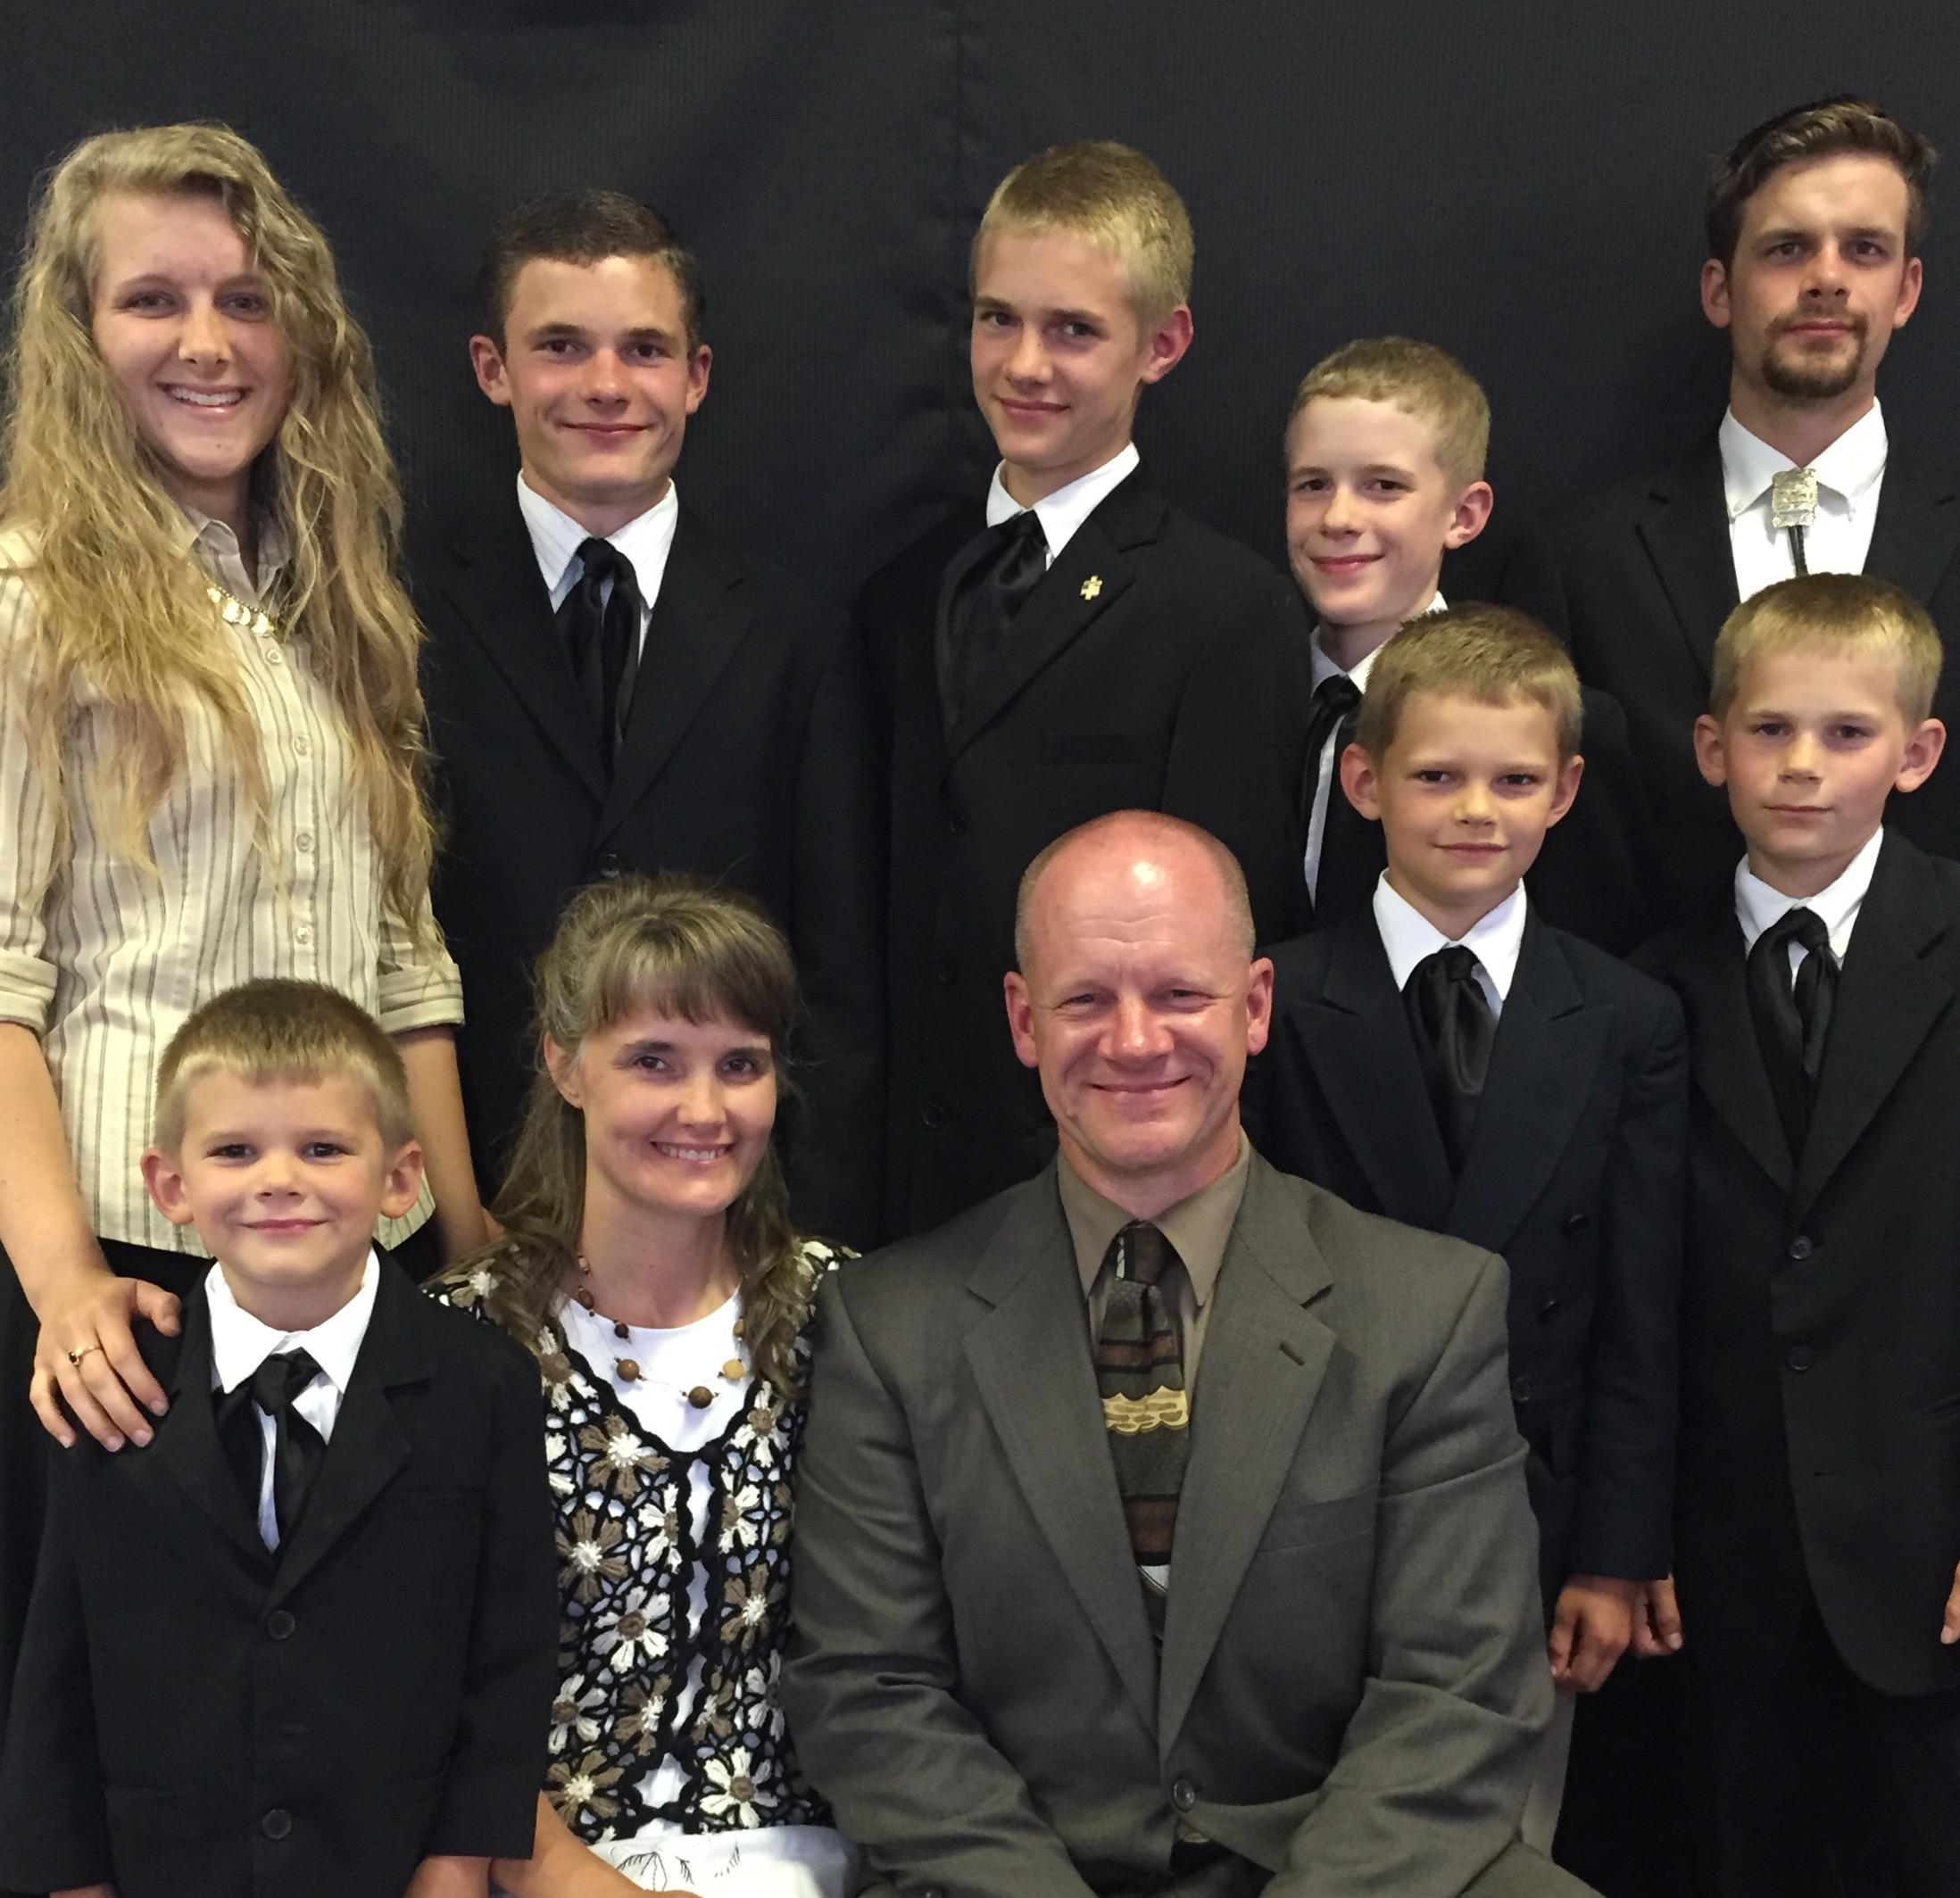 The Goodrick Family    Amanda, David, Joseph, Jeremiah, Daniel, Joshua, Caleb, Pastor, Vicki, and Josiah